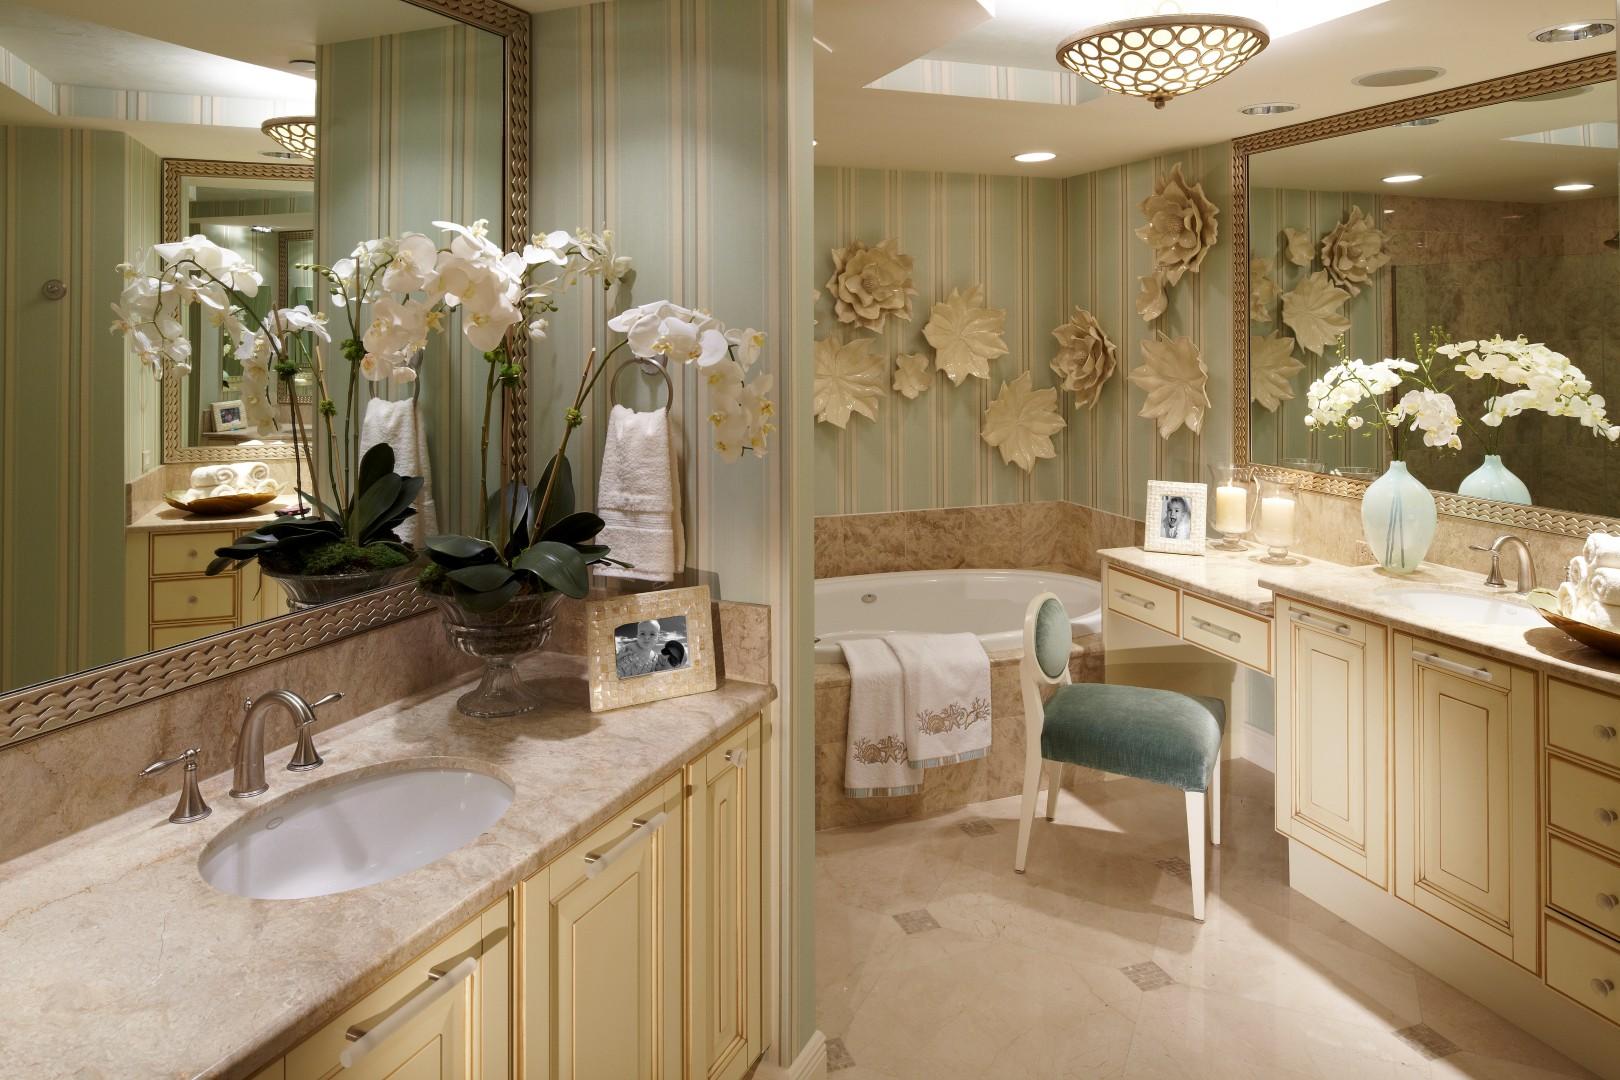 Master Bathroom Ideas Pictures KrBw